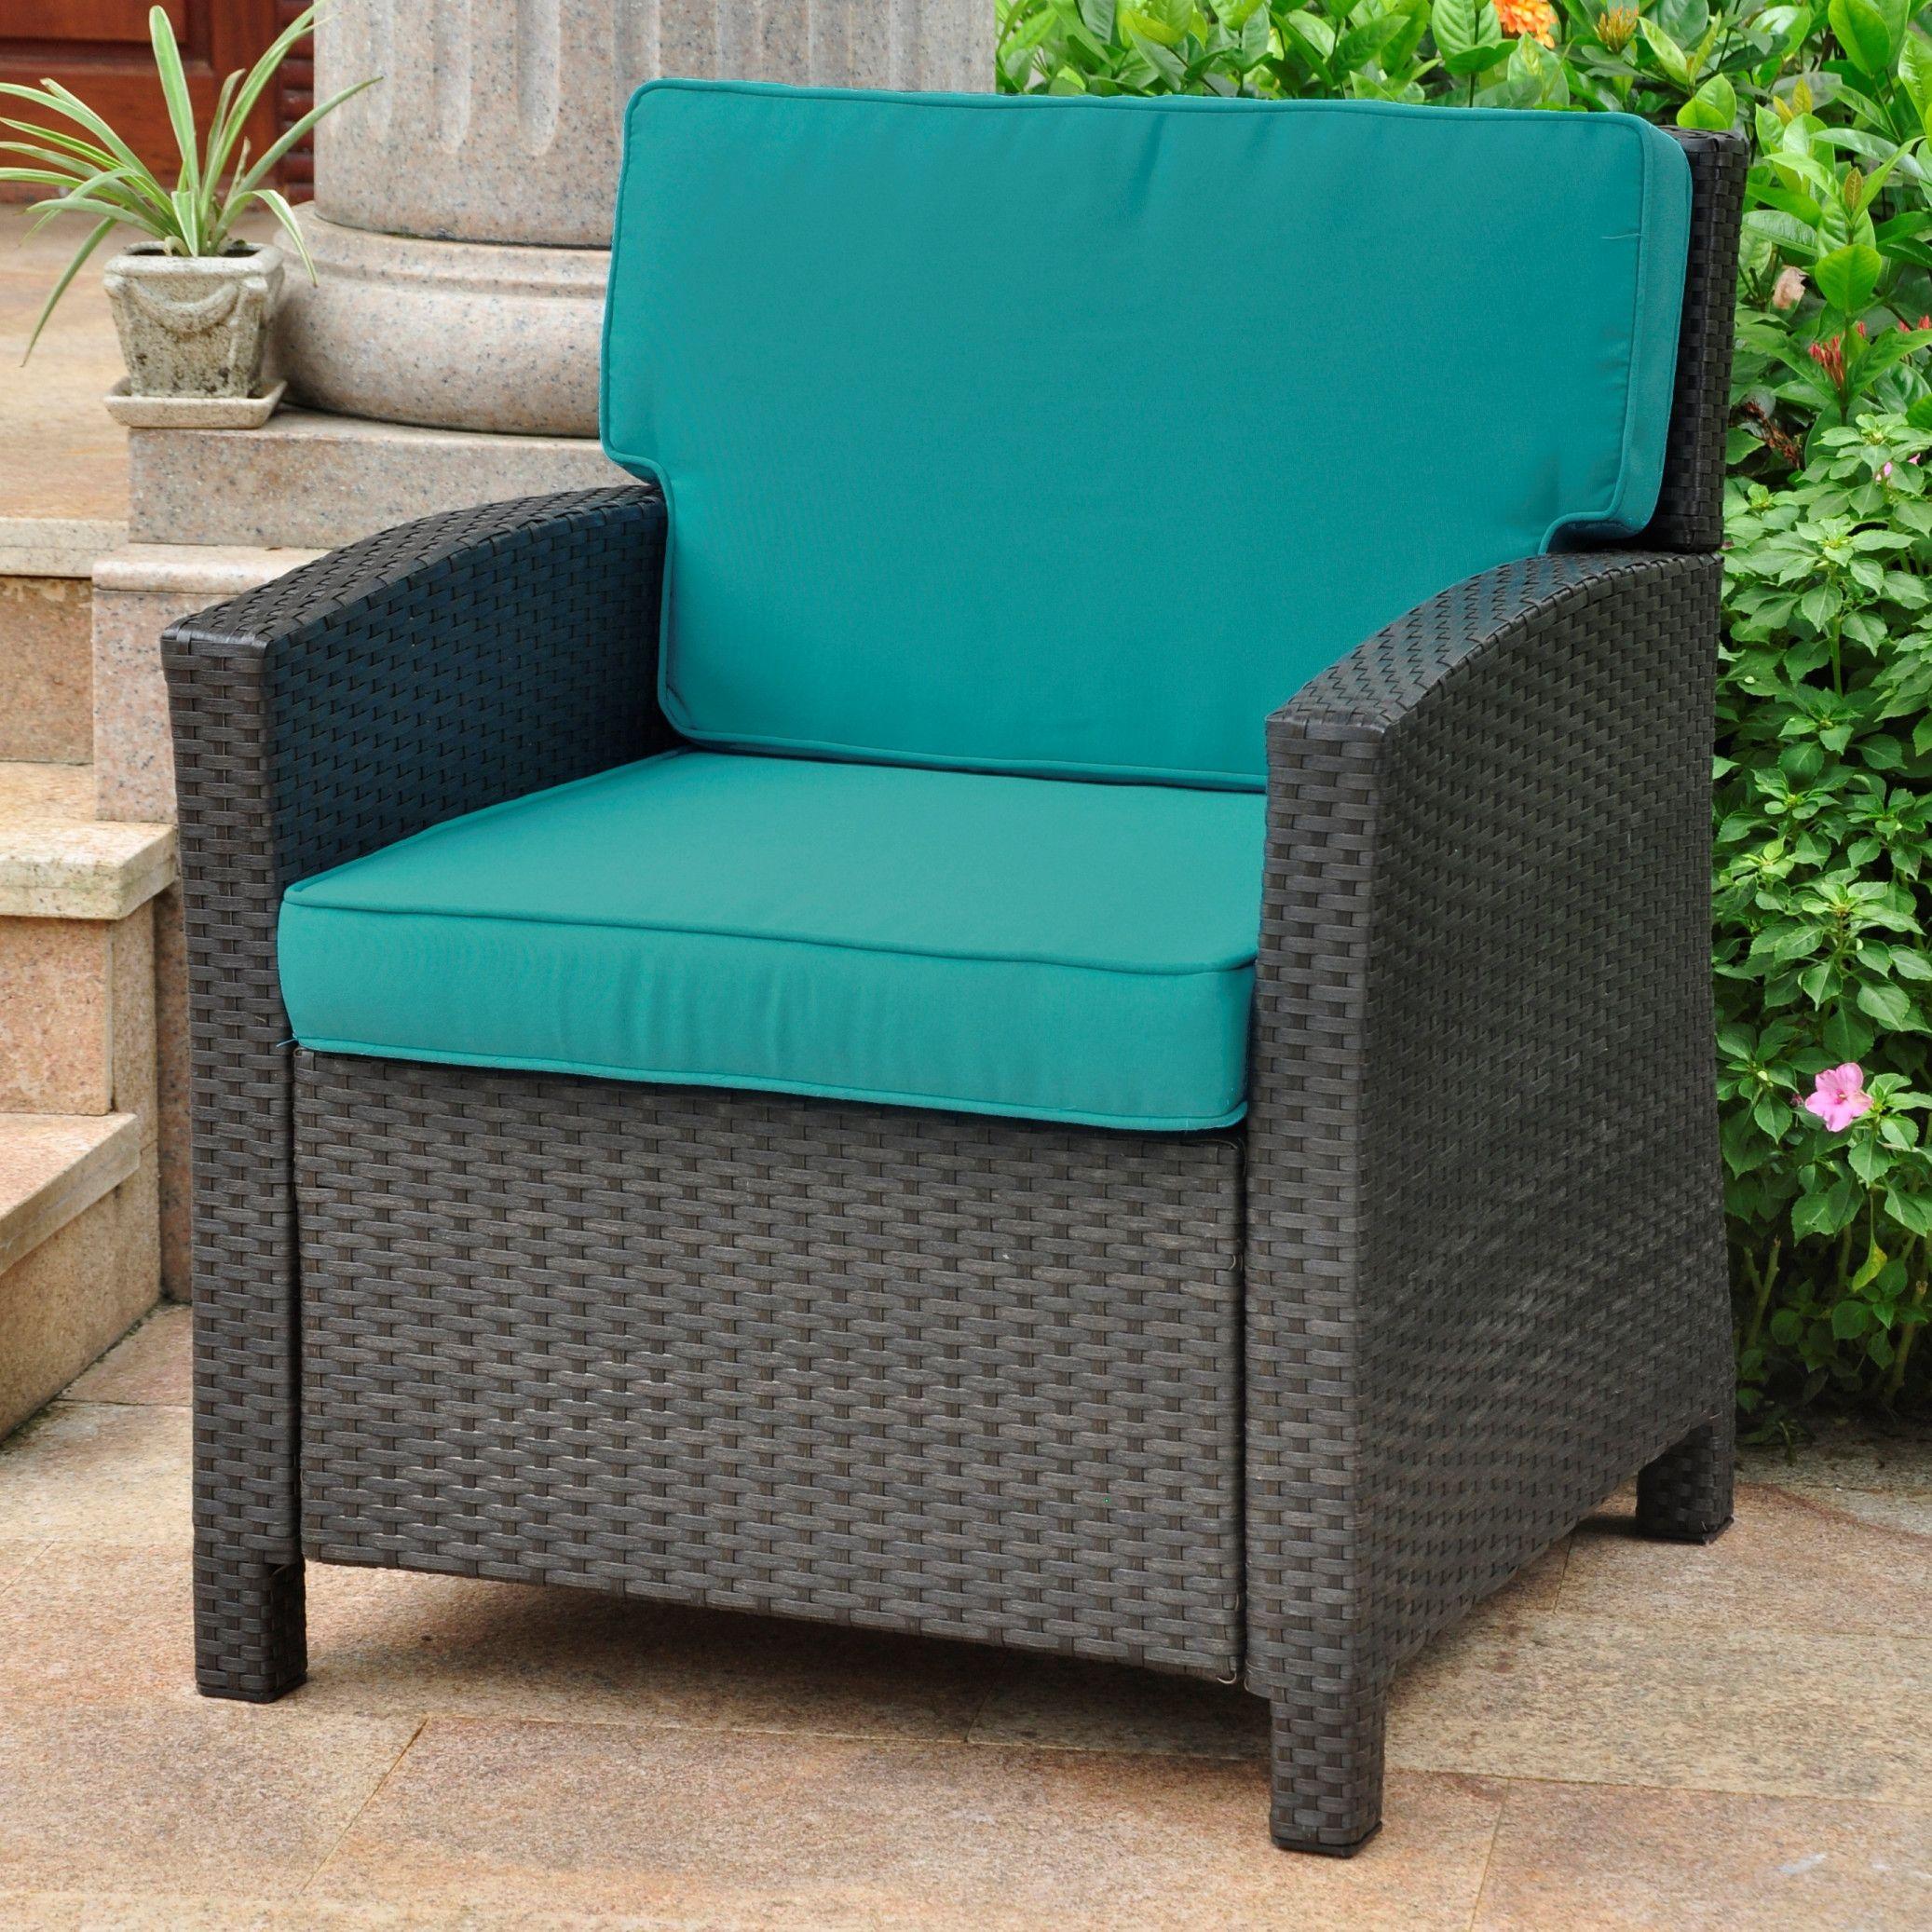 International caravan valencia wicker resin contemporary patio chair with cushion